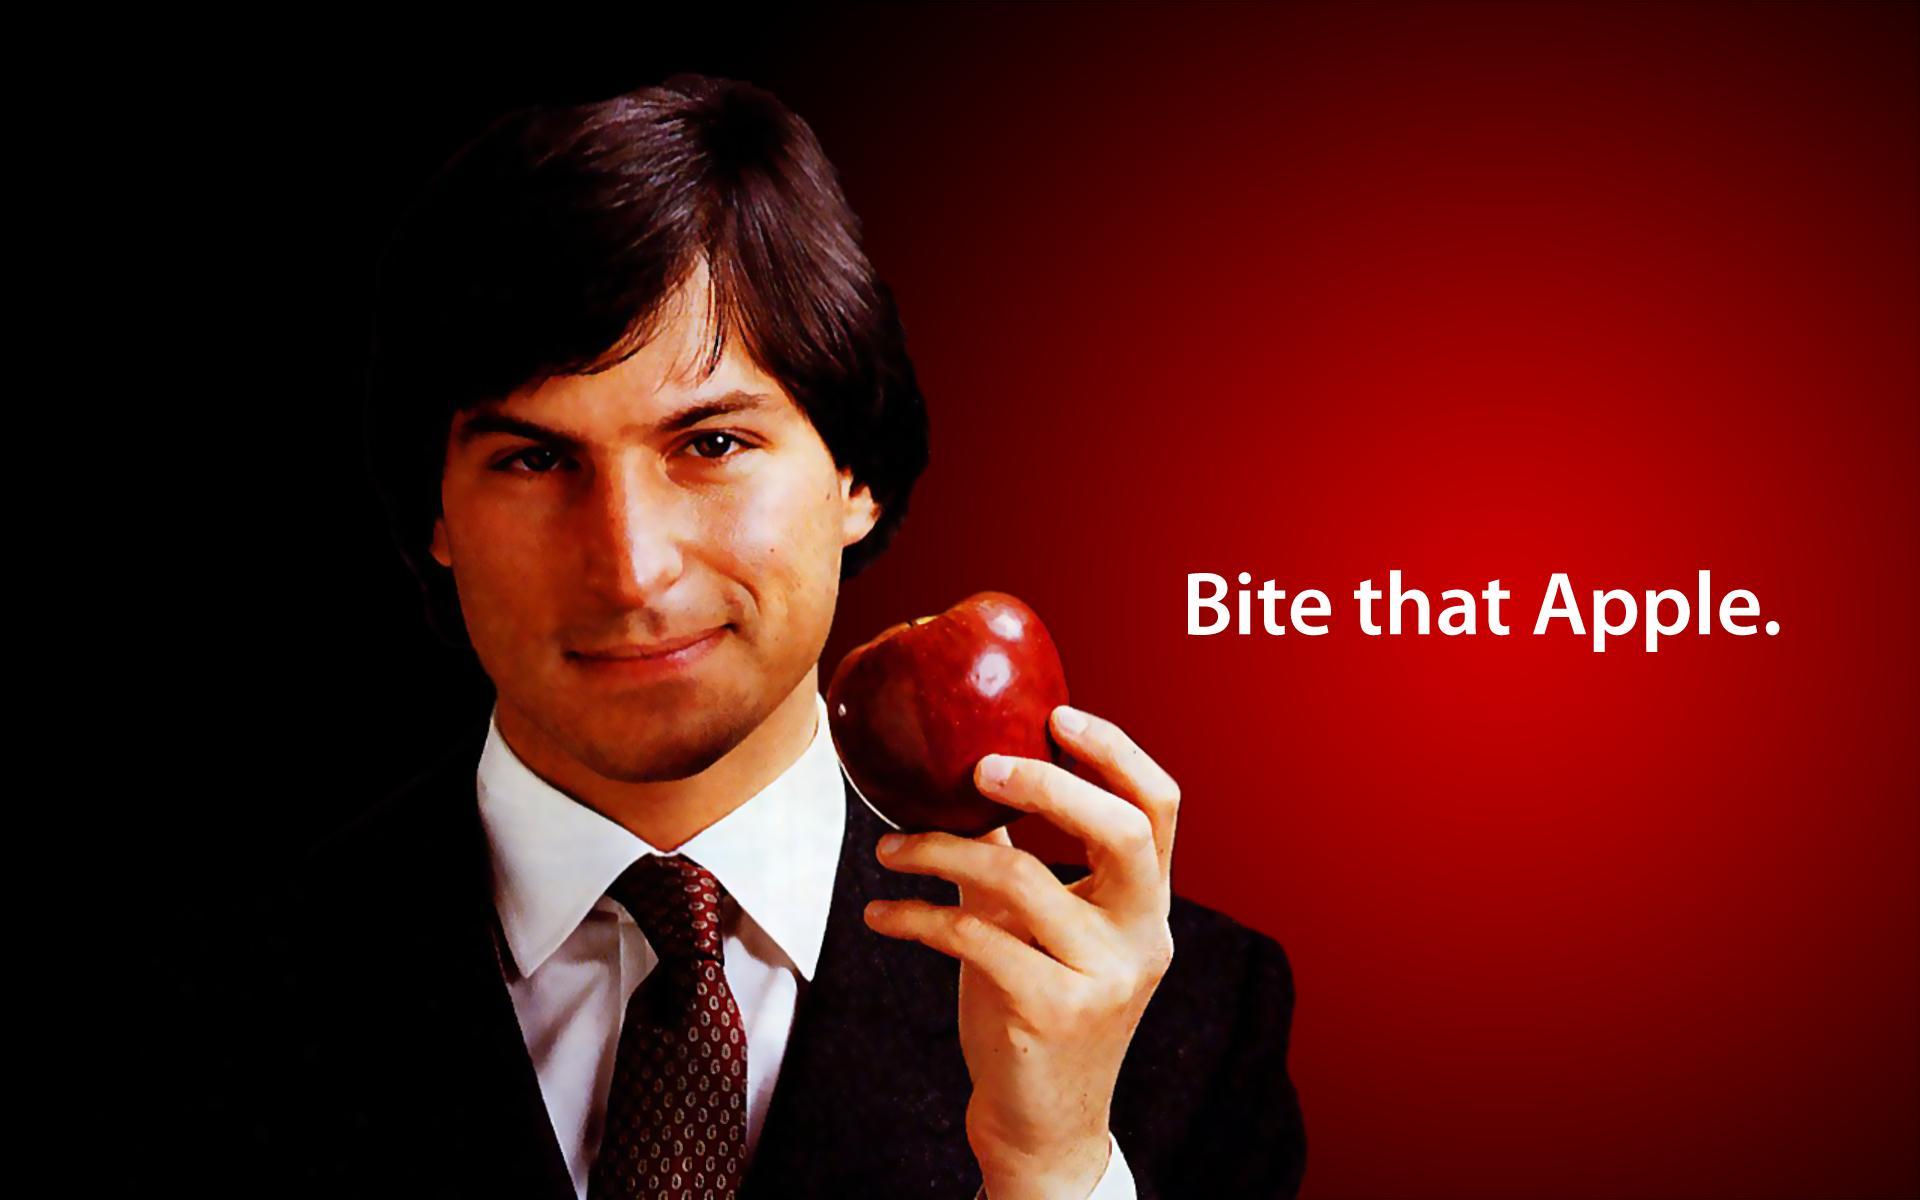 10 Tribute Remembering Steve Jobs Wallpapers